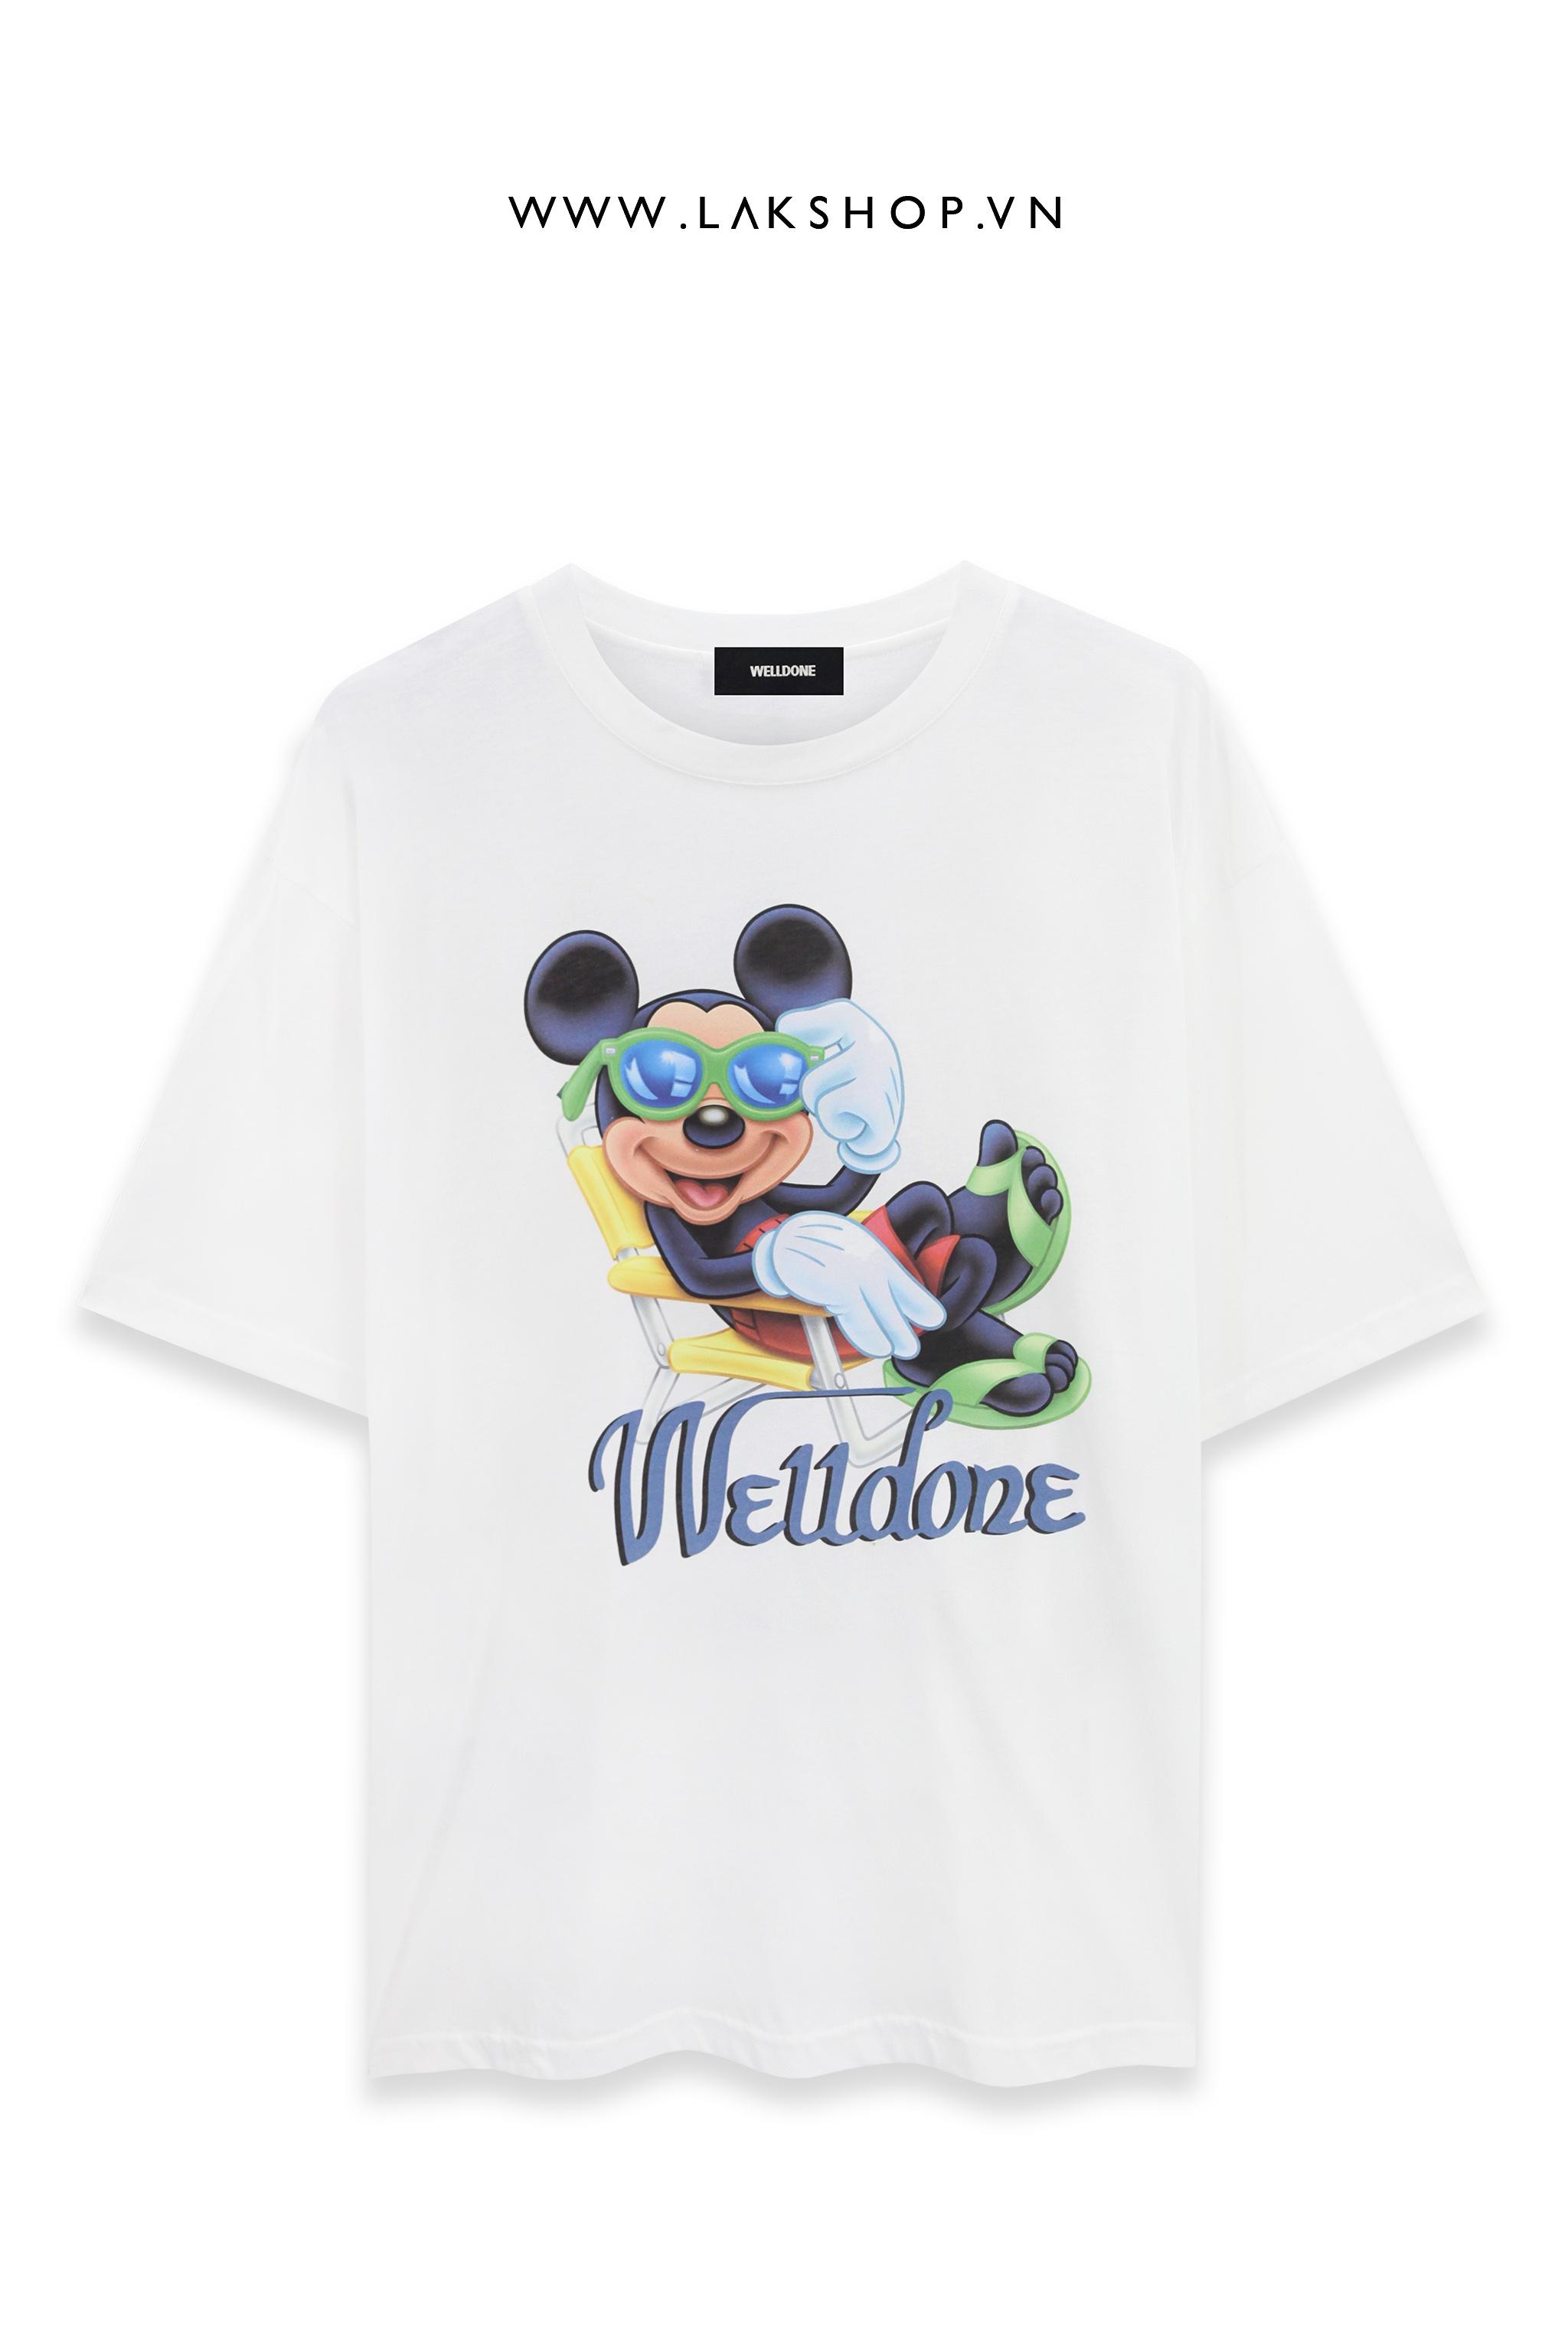 Welldone x Mickey White Oversized T-Shirt (bản đẹp 1:1)